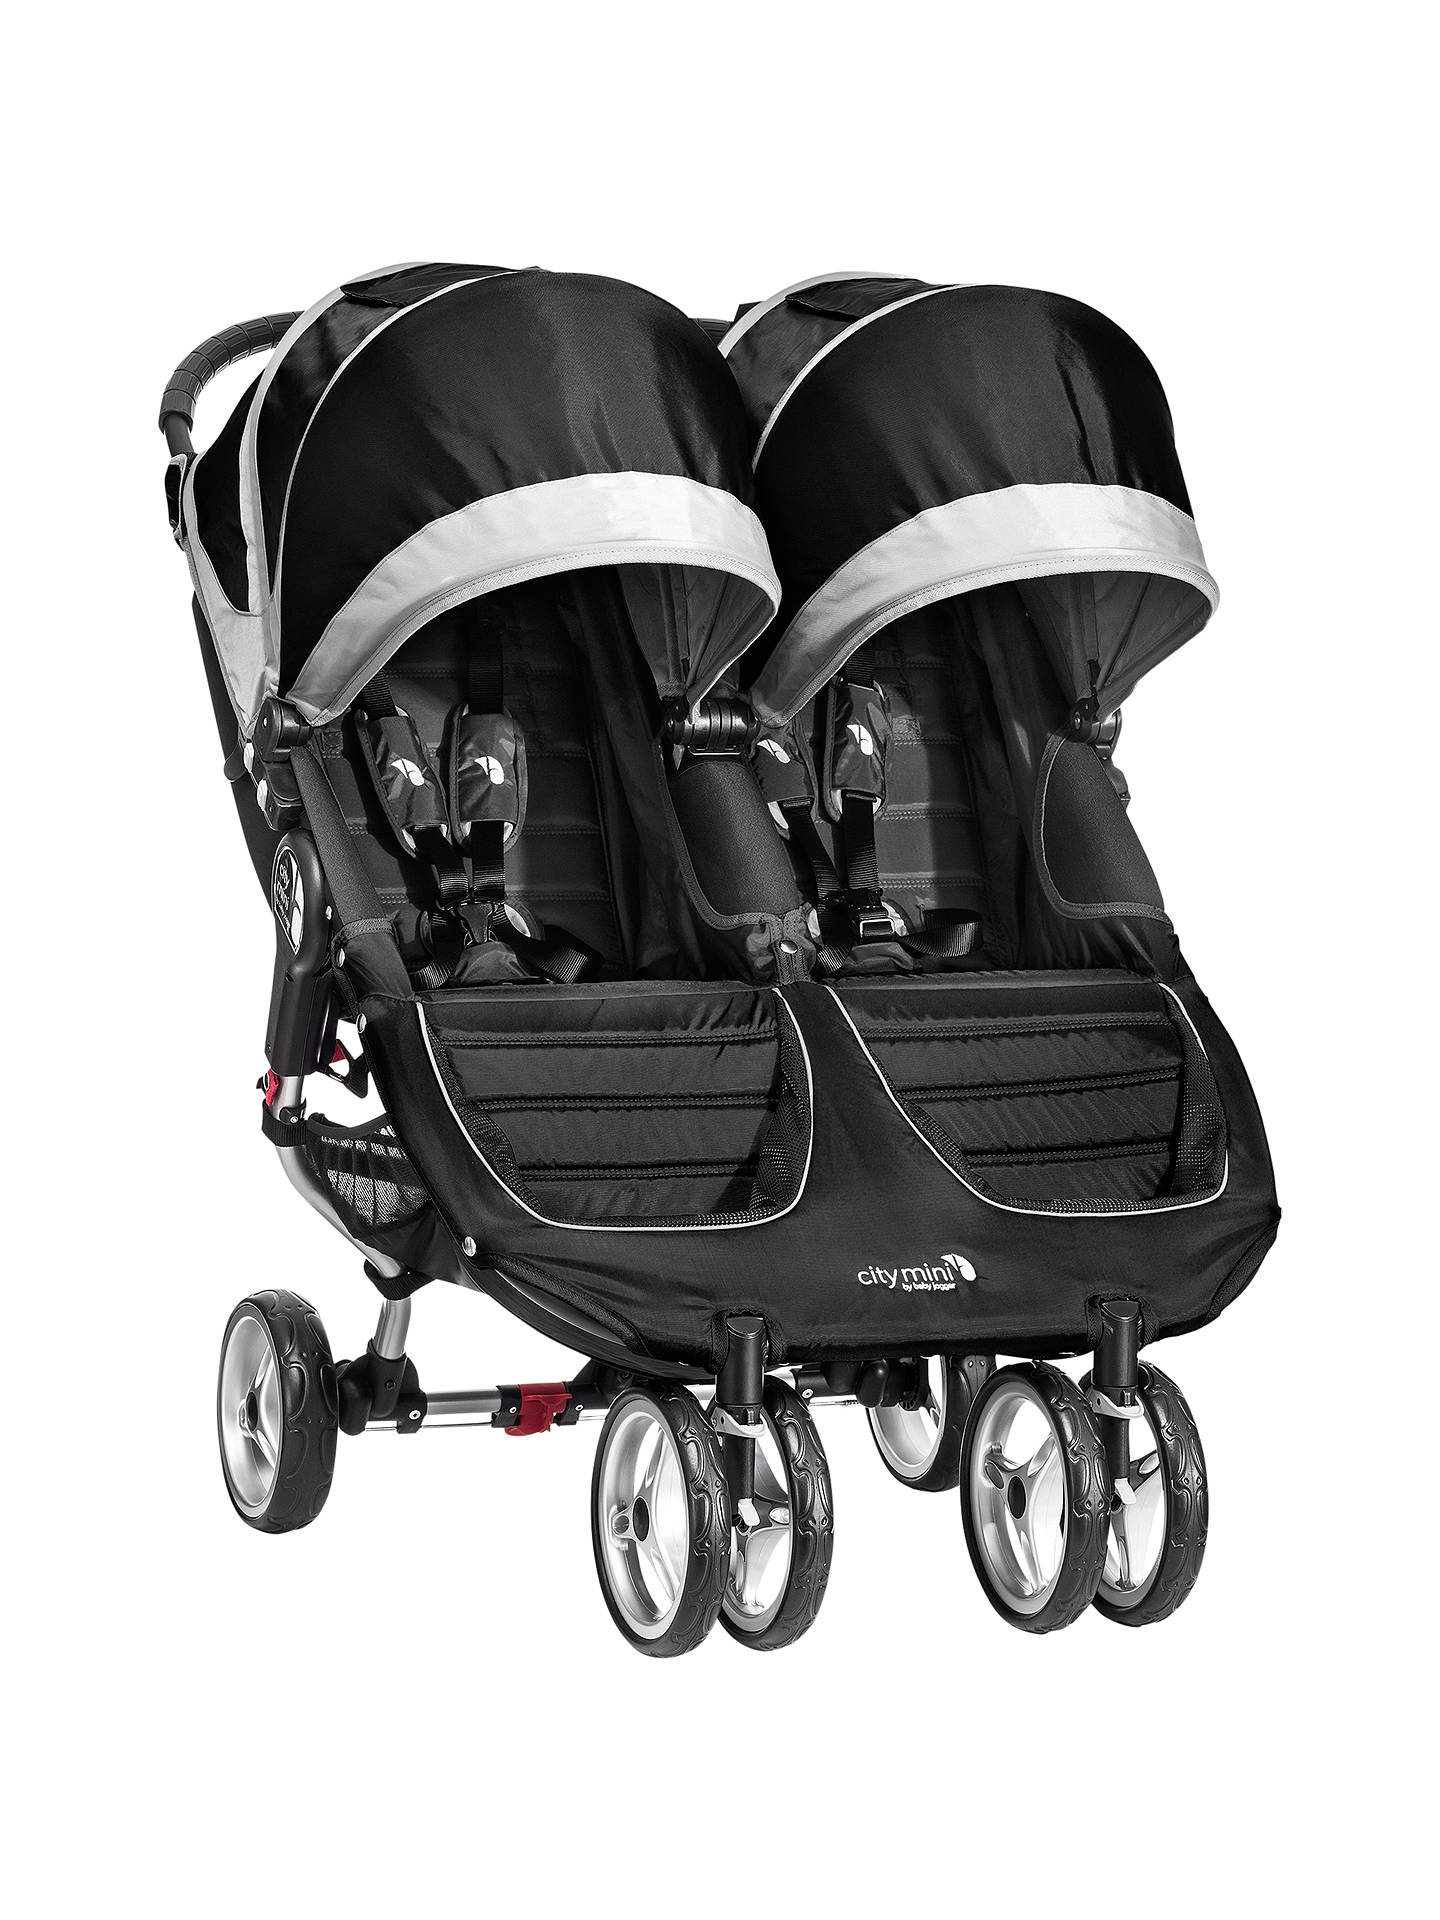 Baby Jogger City Mini Twin Pushchair Black Grey At John